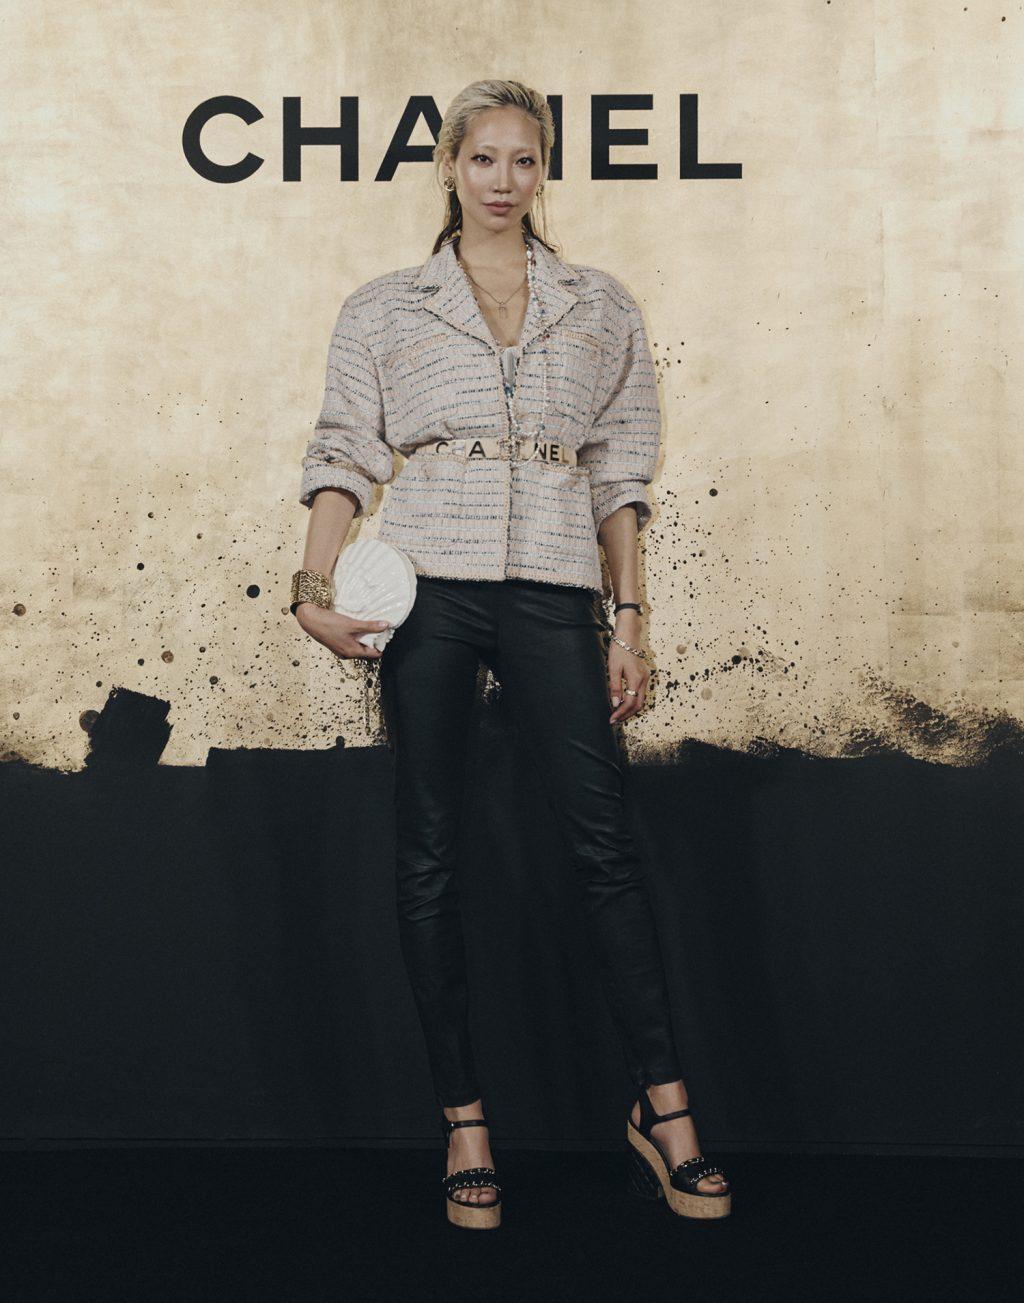 park soo joo mặc áo vest vải tweed màu hồng quần da đen chanel tại métiers d'art show